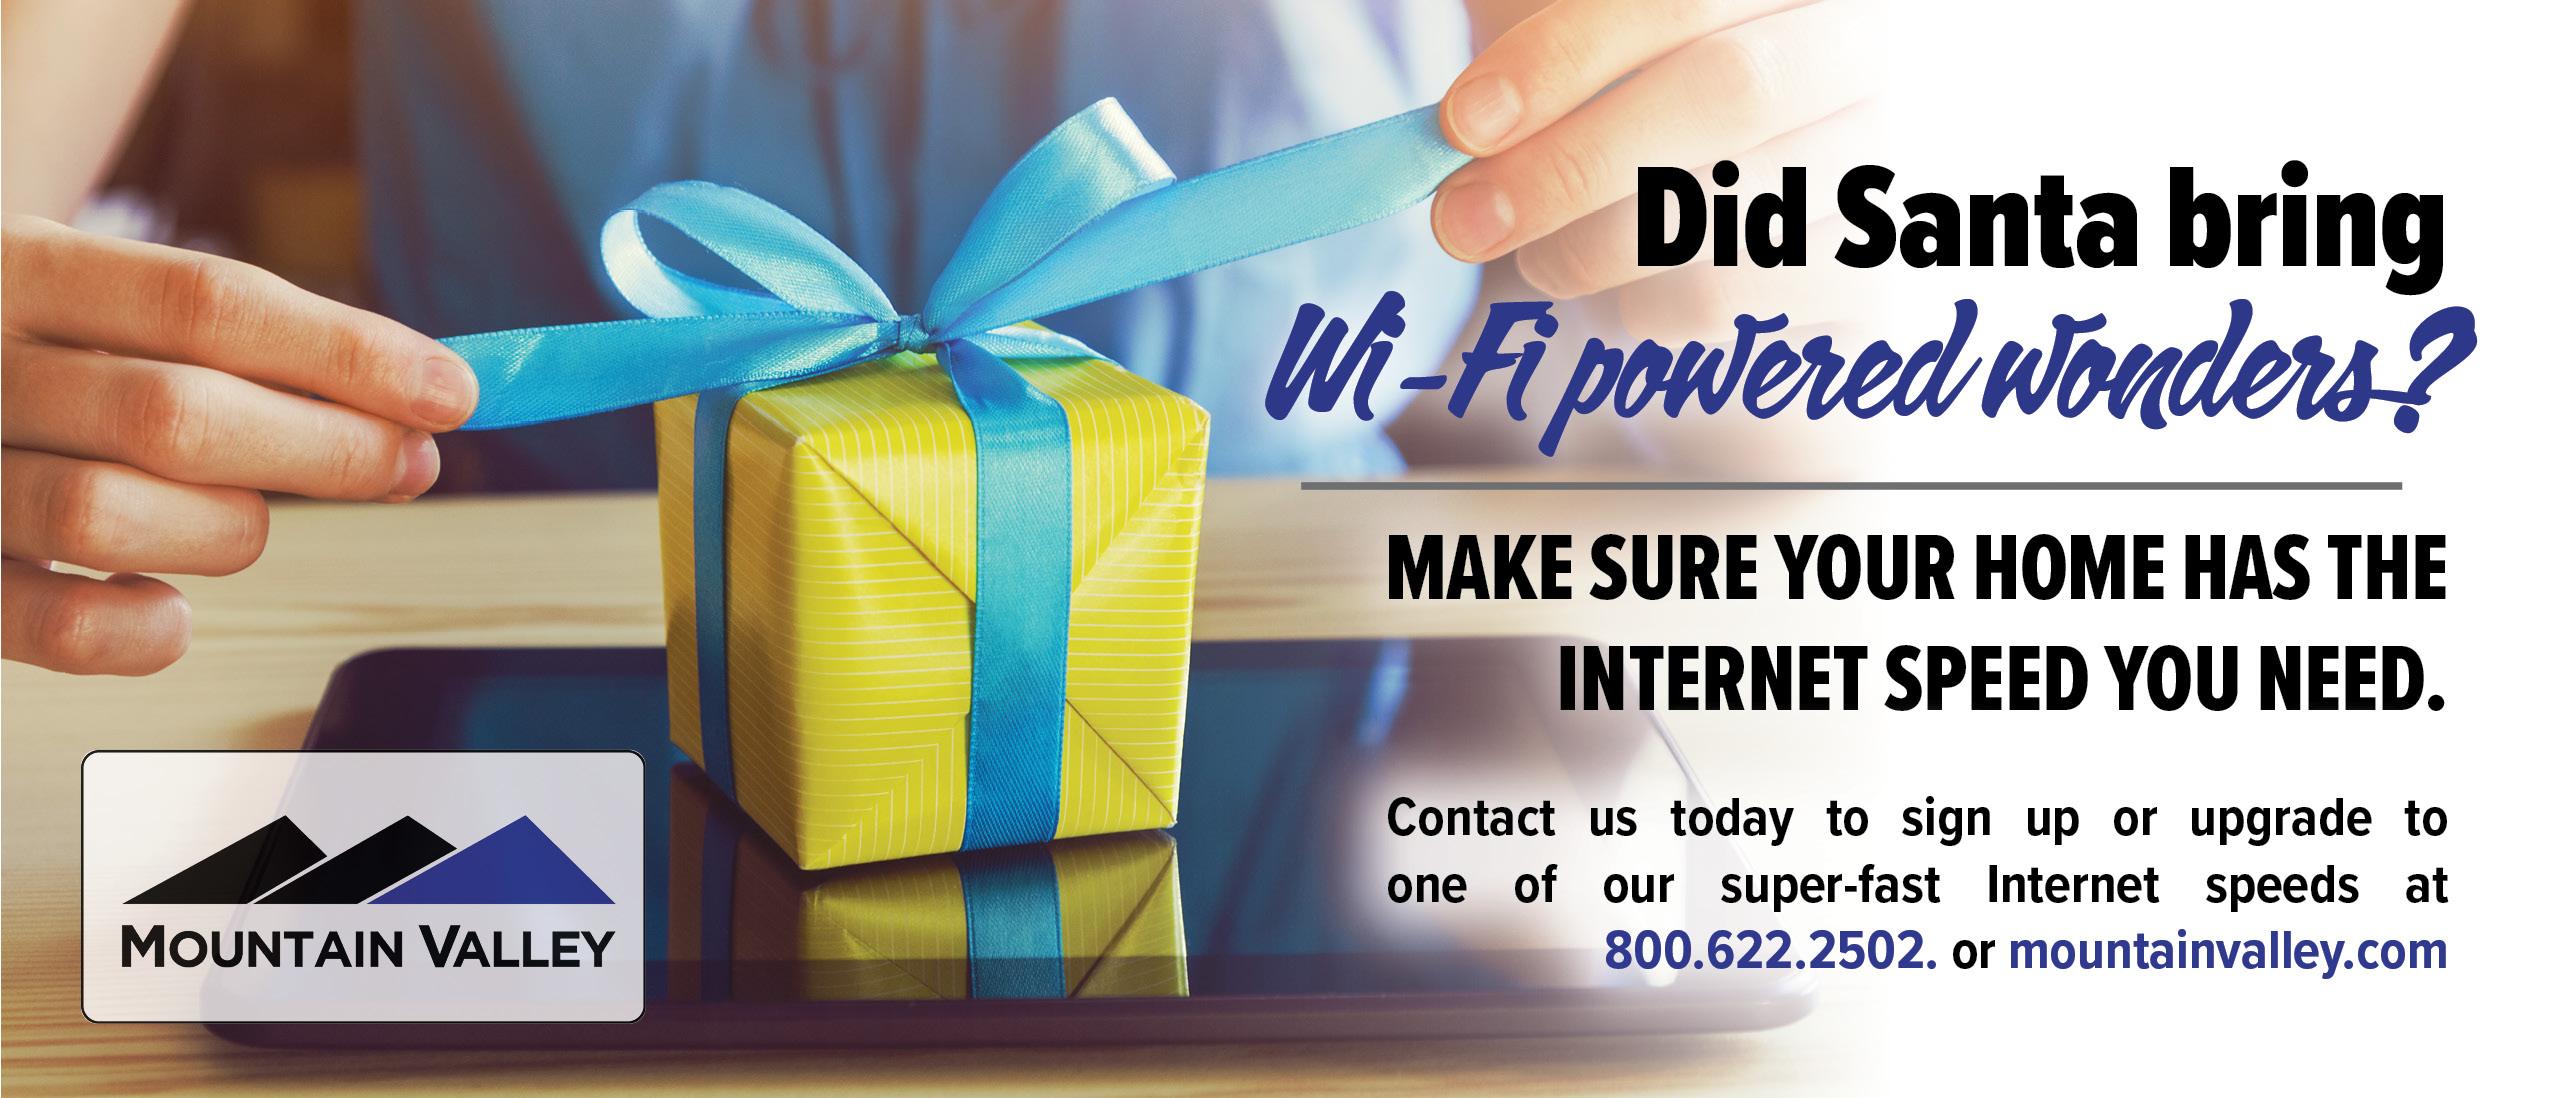 WiFi Powered wonders bill insert